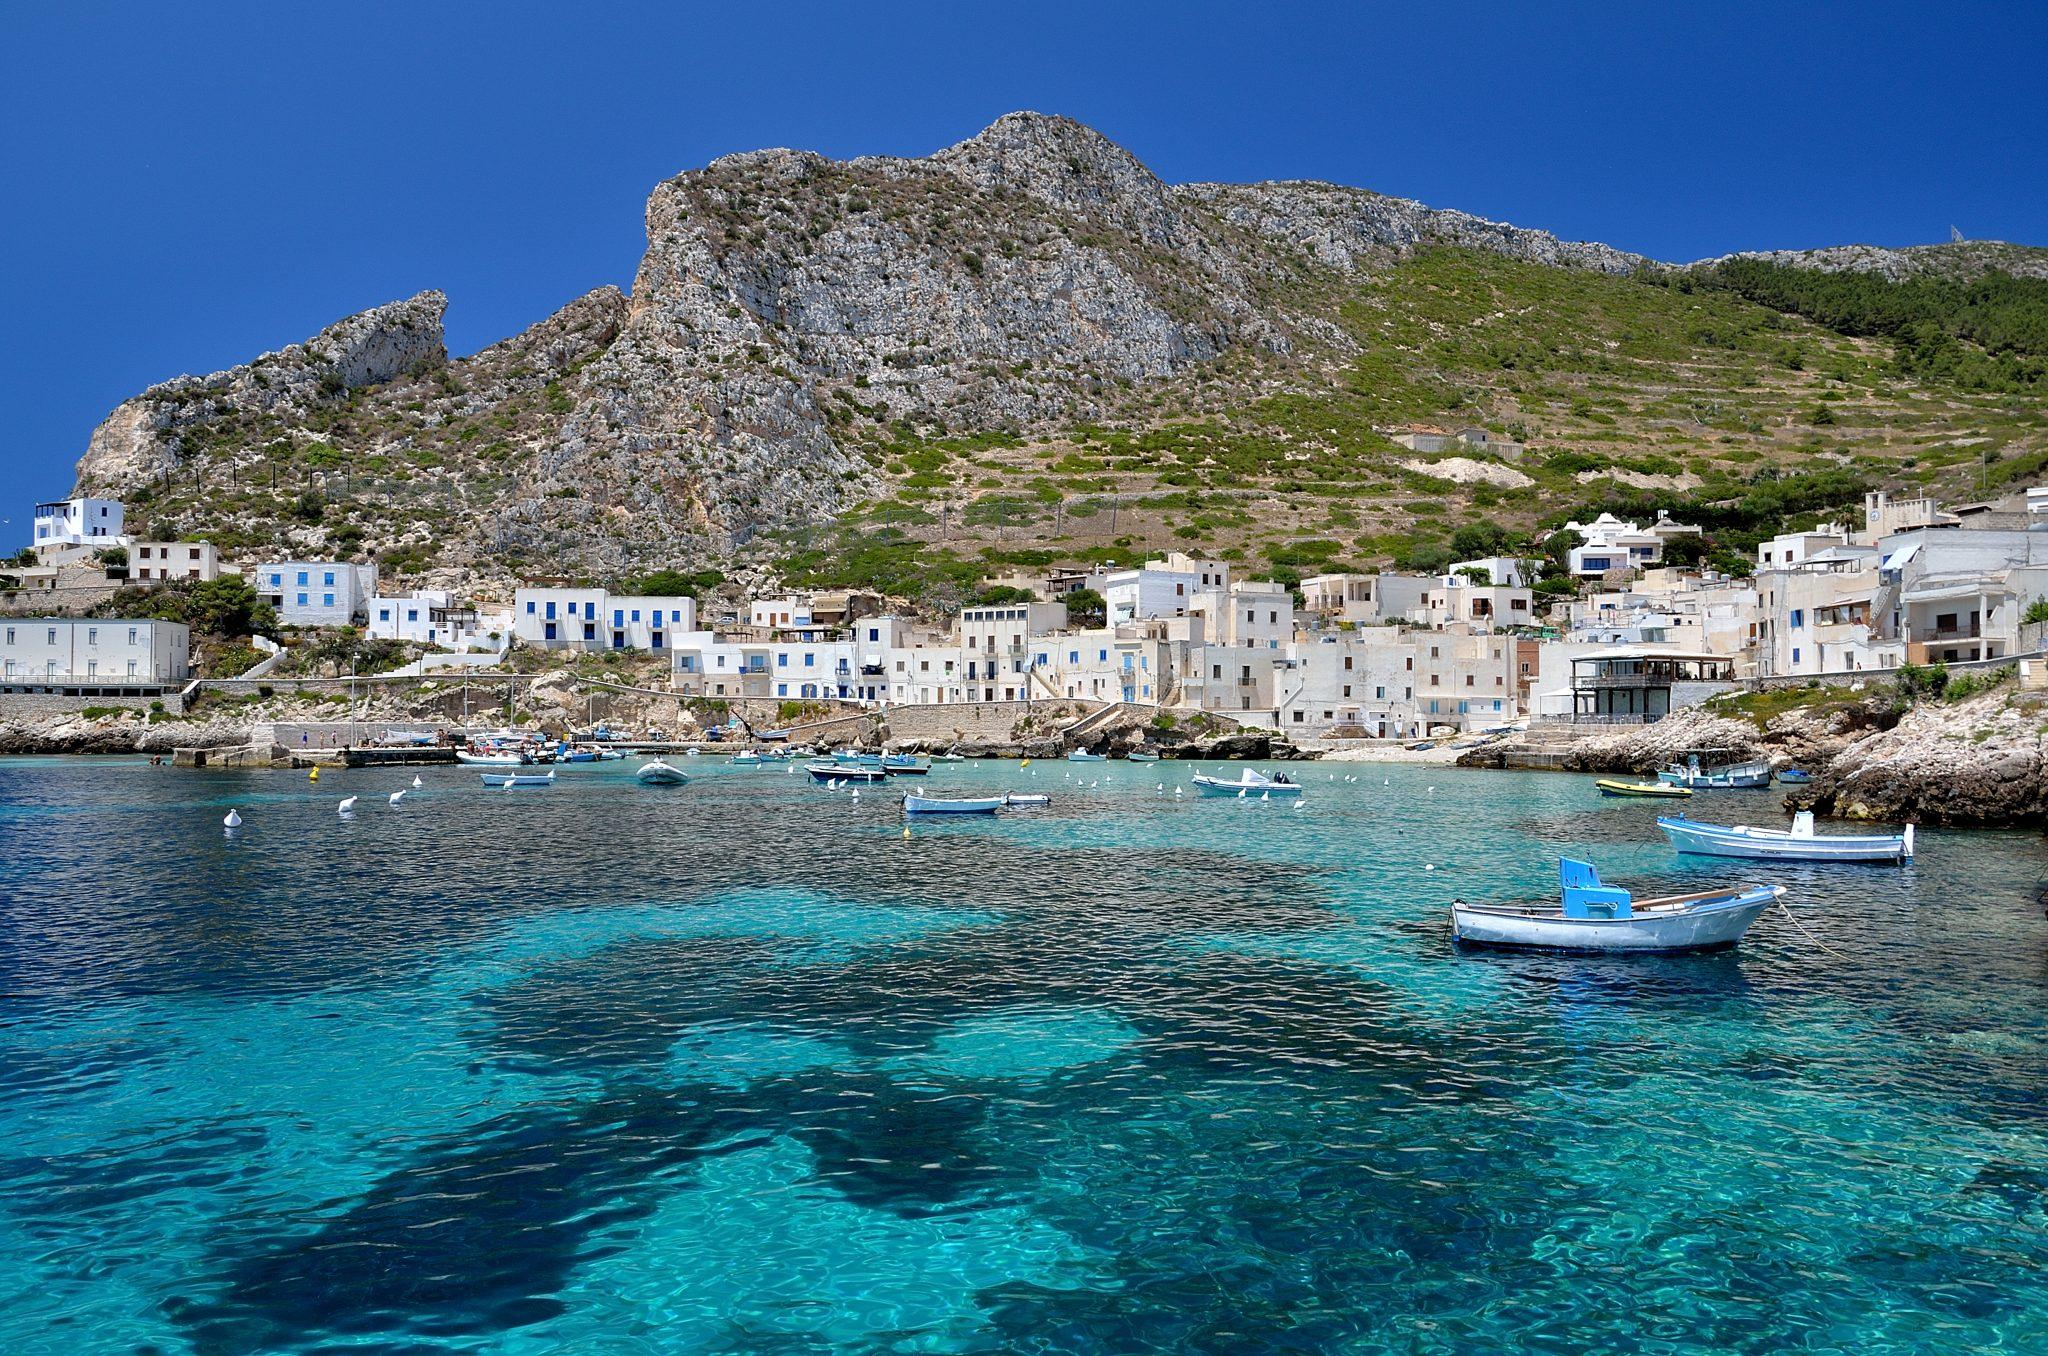 Visitar sicilia una isla italiana con encanto turismo for Setacciavano la sabbia dei fiumi